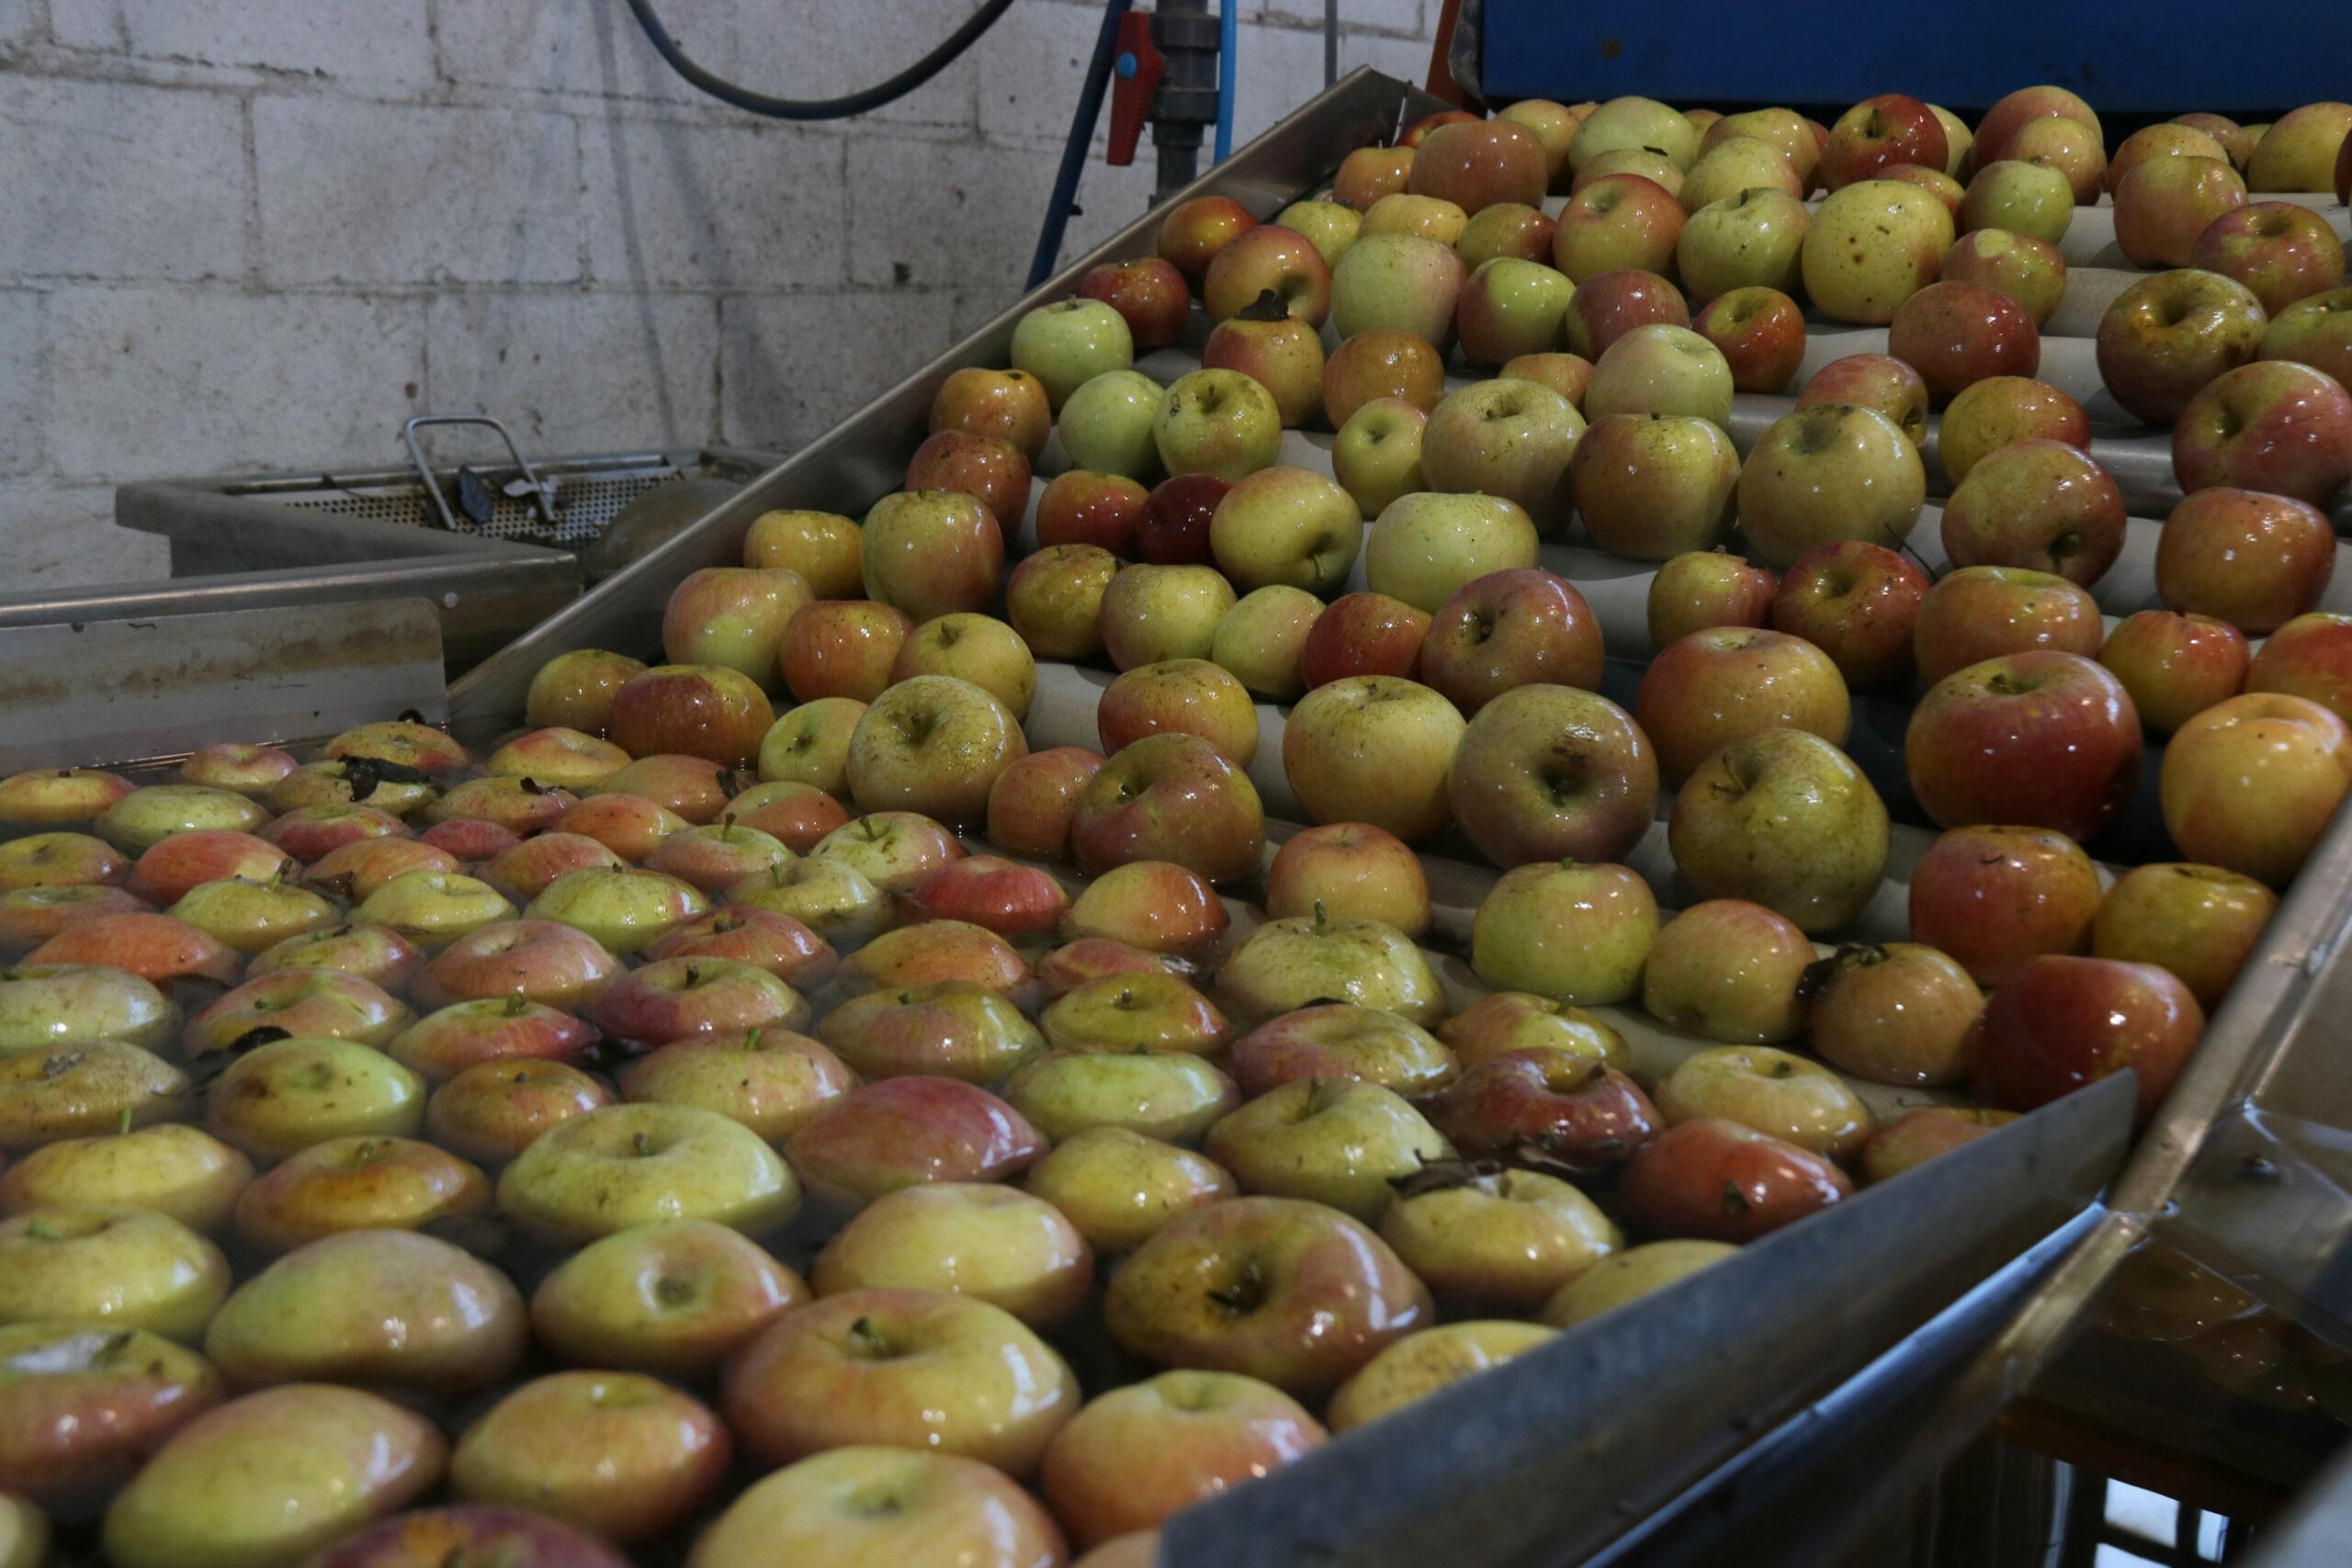 Nombroses pomes | ACN